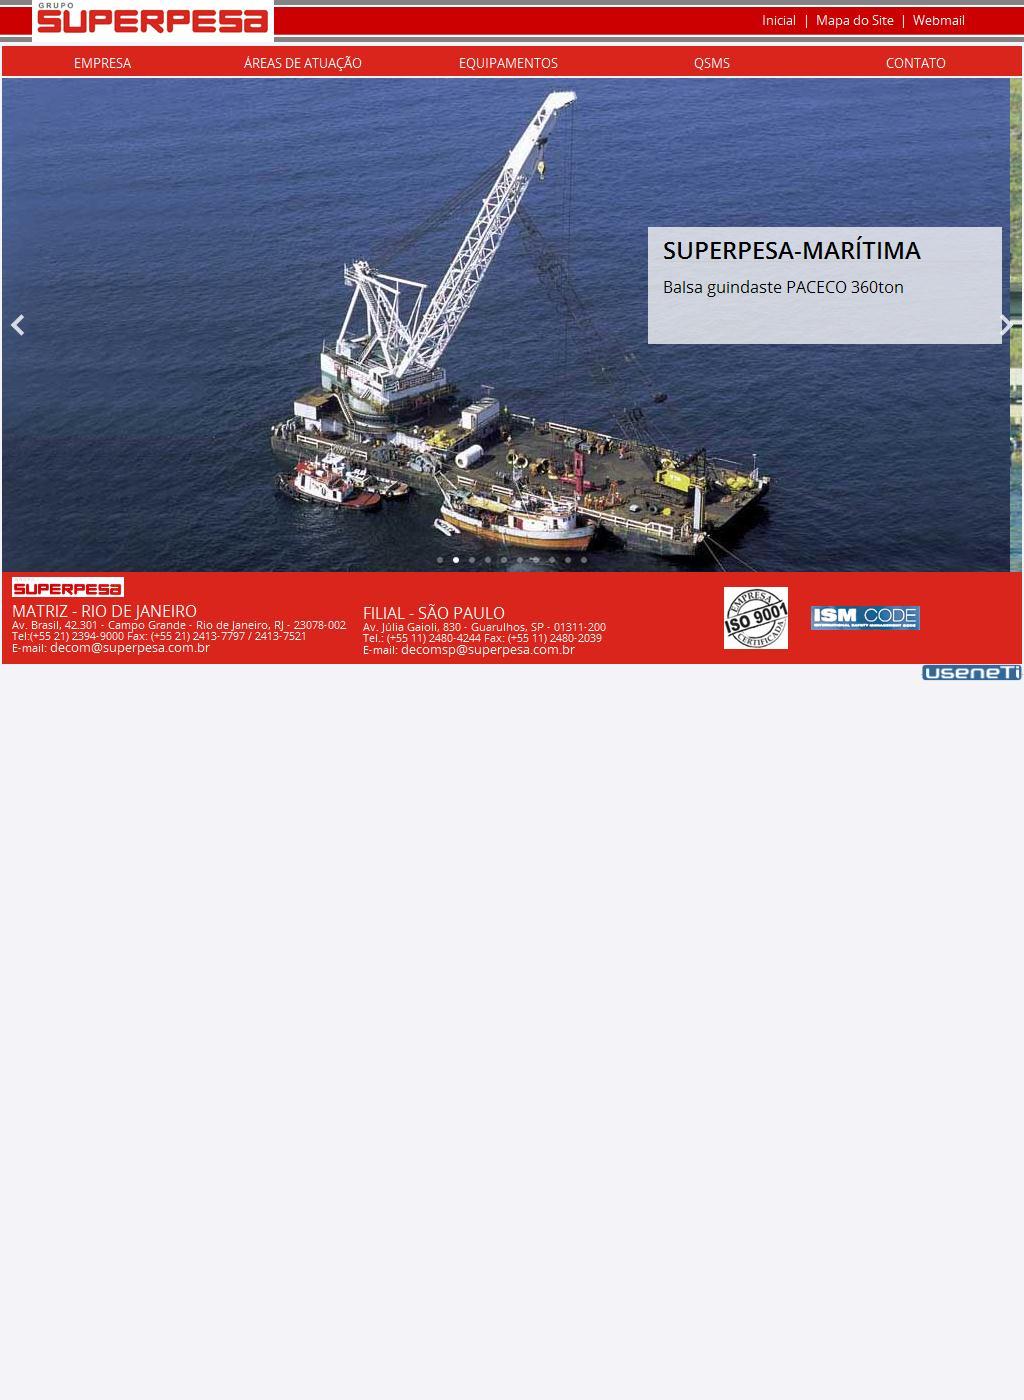 Superpesa | Transportes terrestres e marítimos